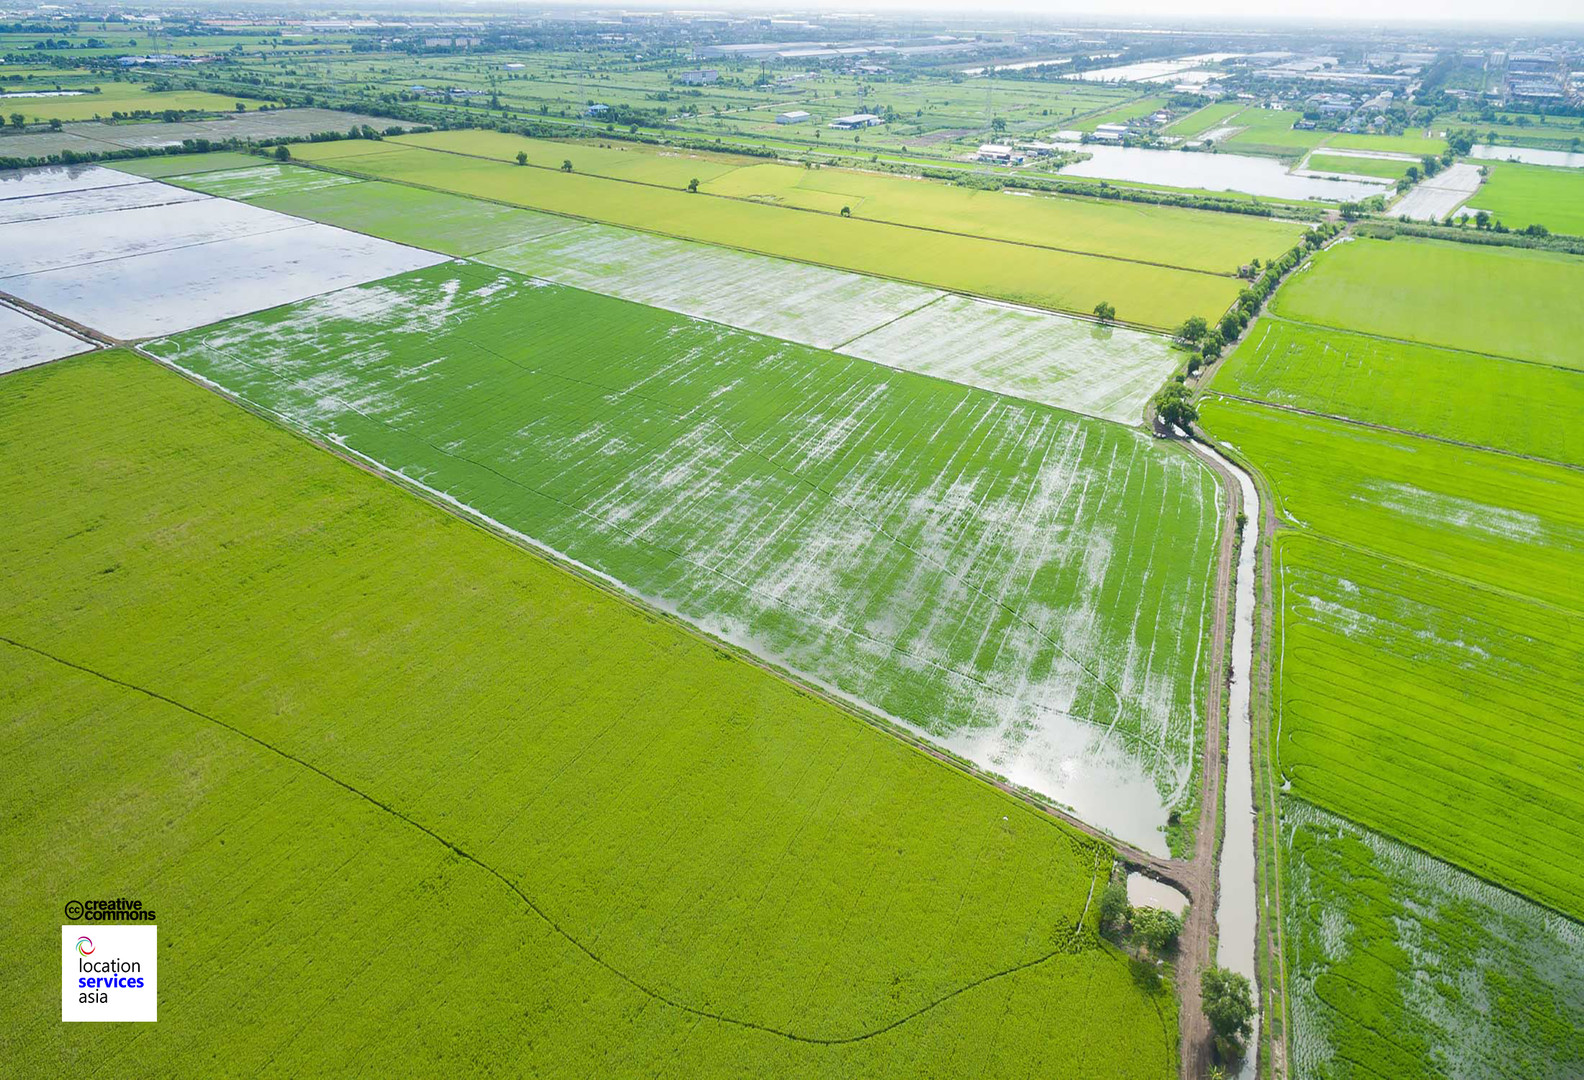 thai film locations farms fields q.jpg